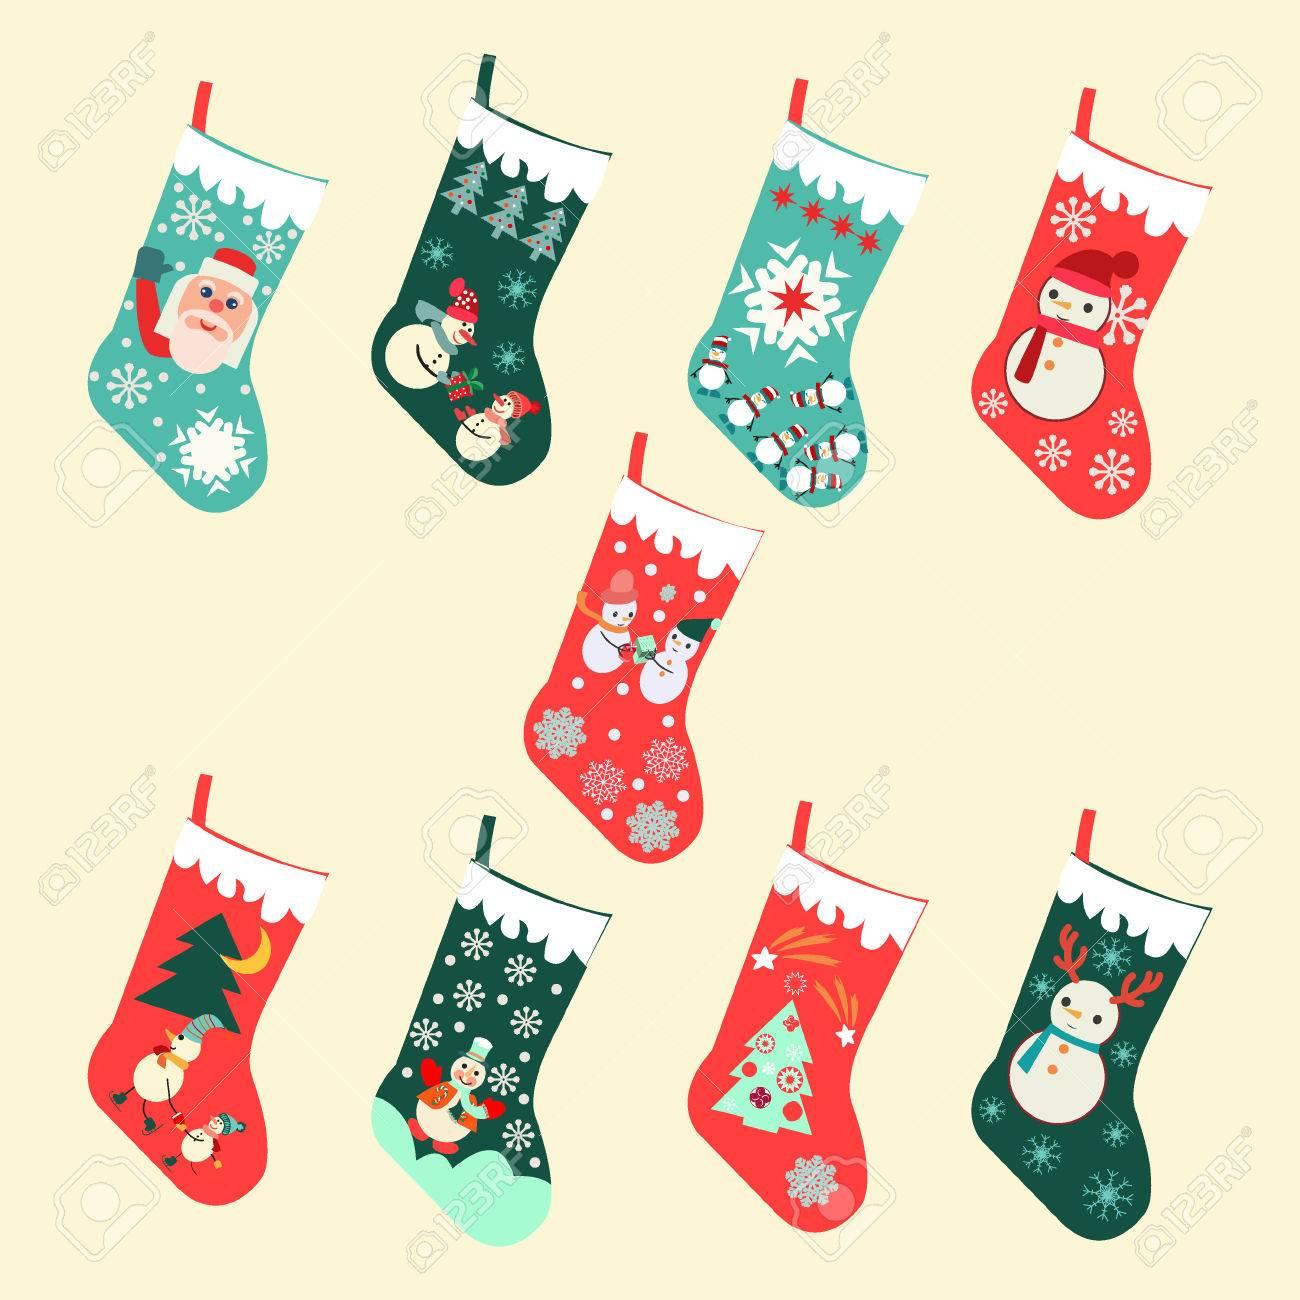 Christmas Stockings Cartoon.Vector Set Of Cute Cartoon Christmas Socks Illustration